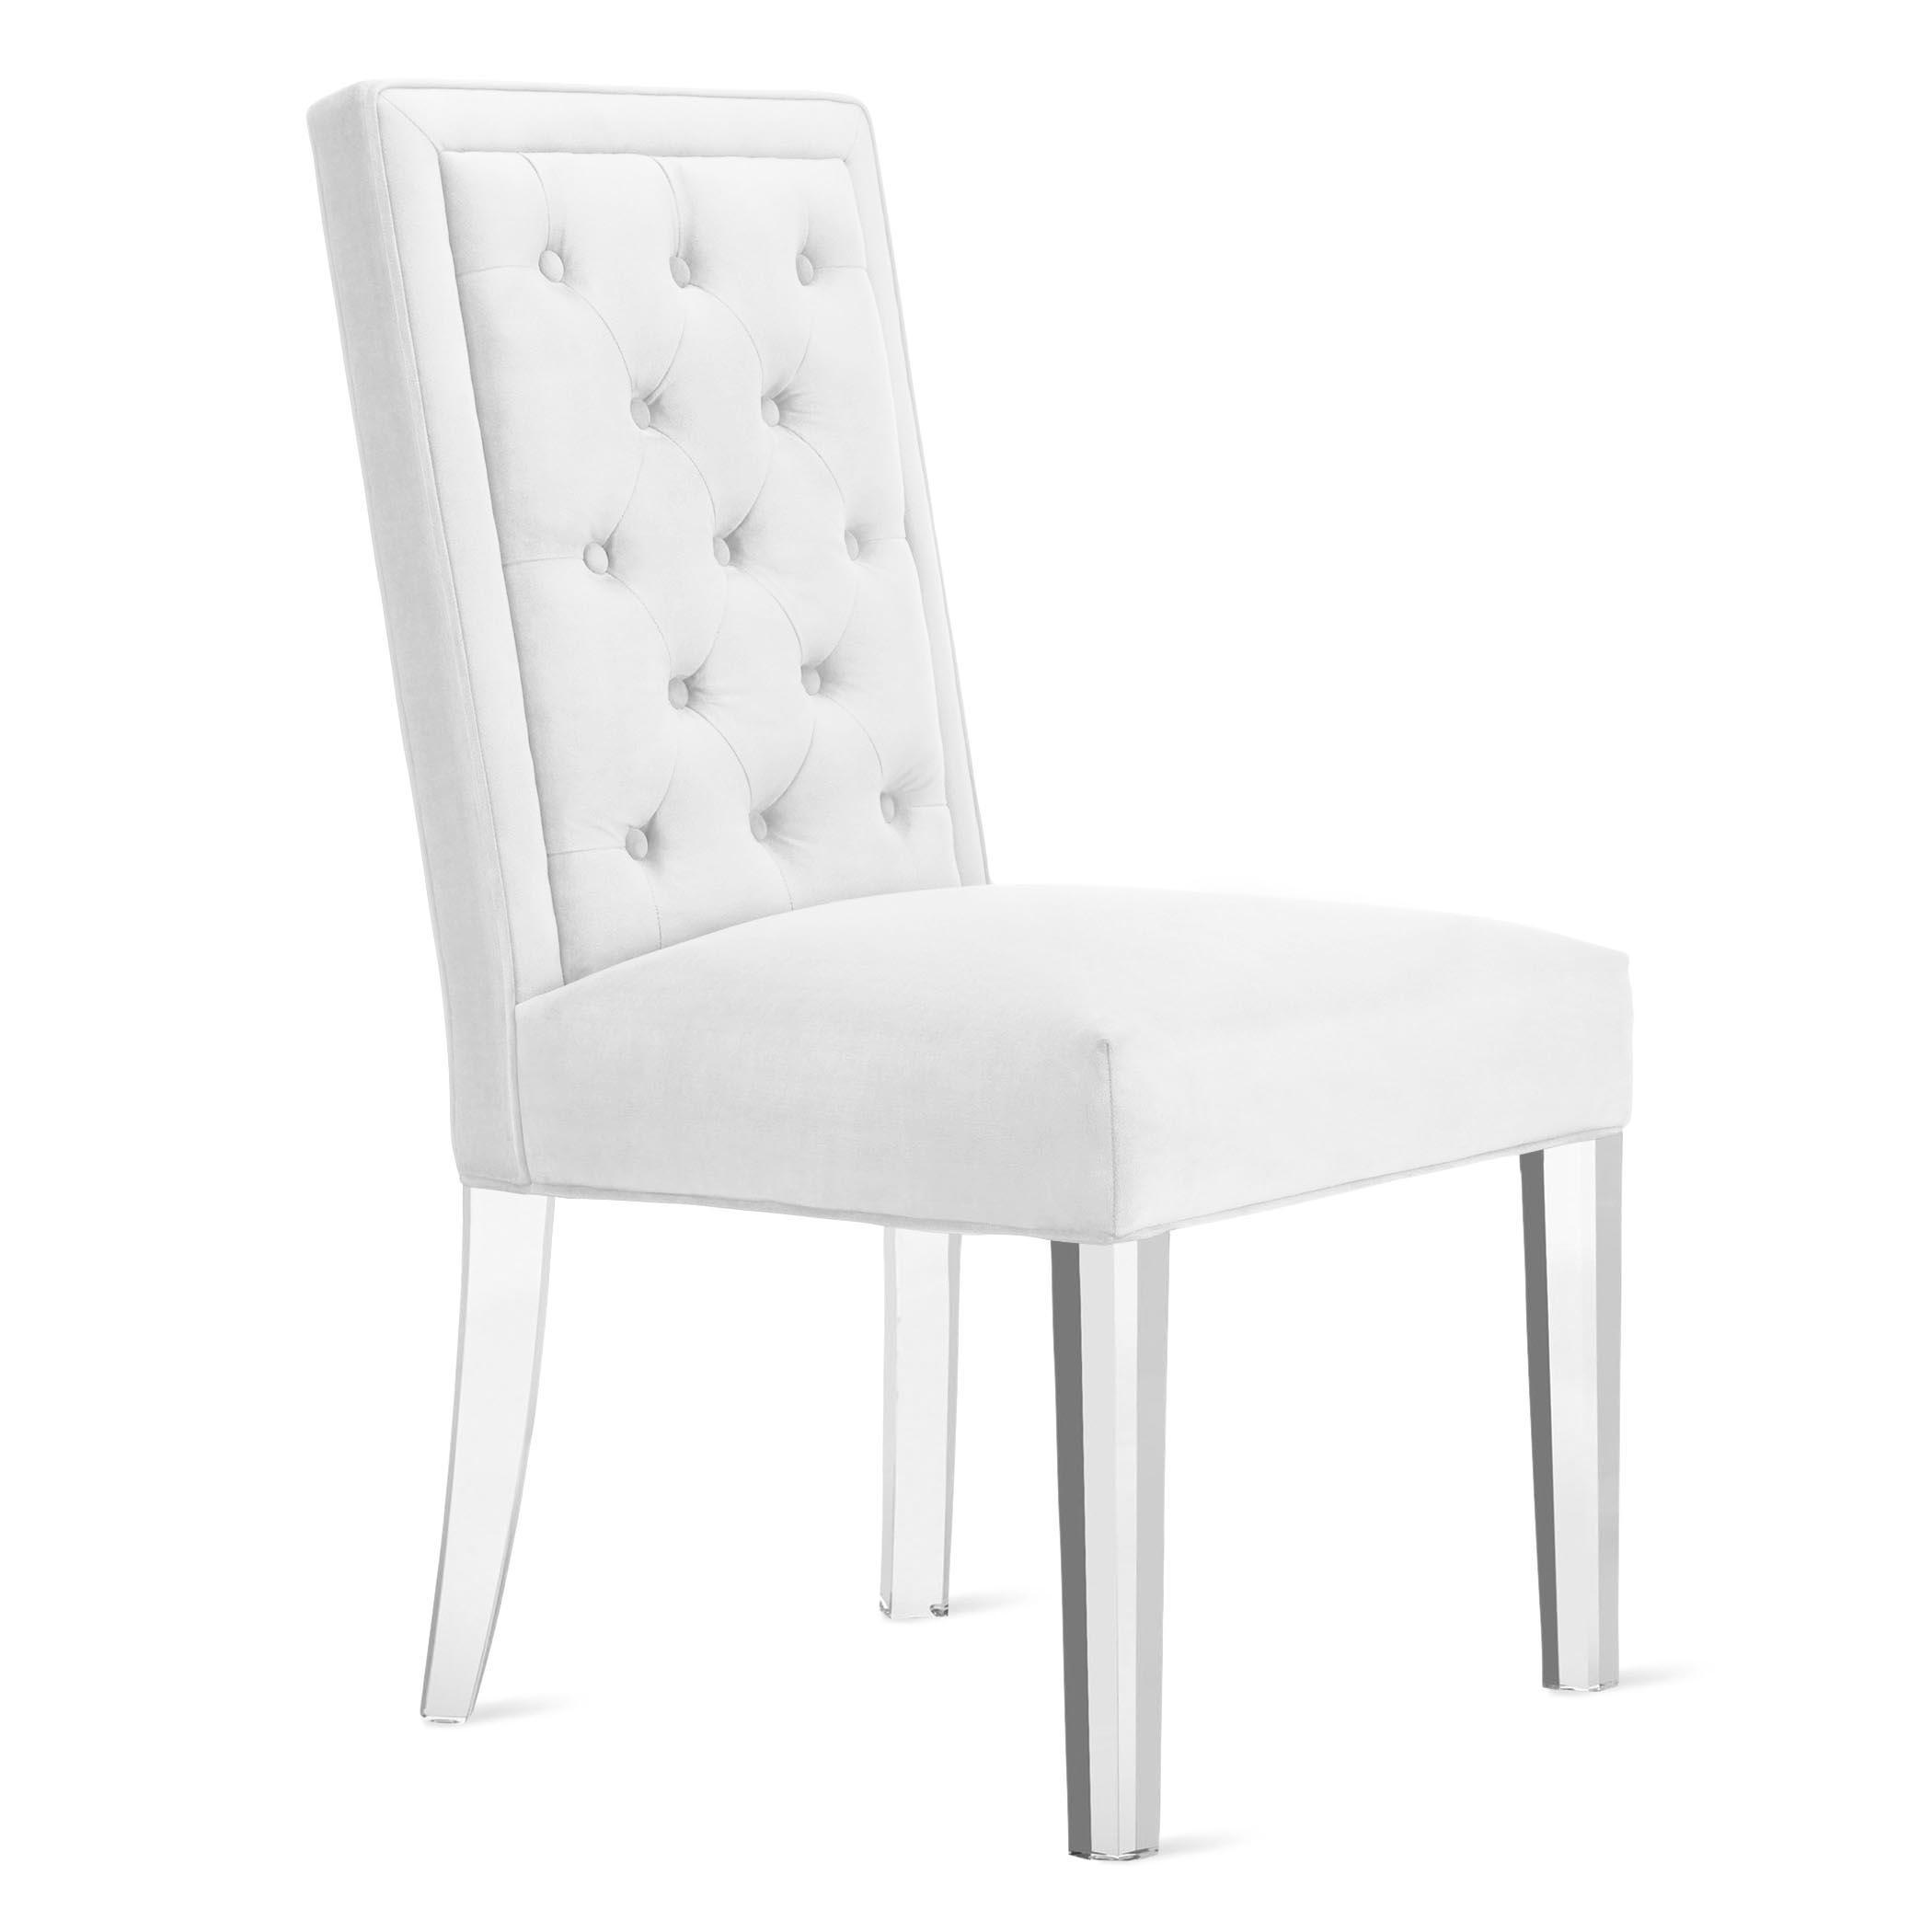 Maxwell Dining Chair - Acrylic